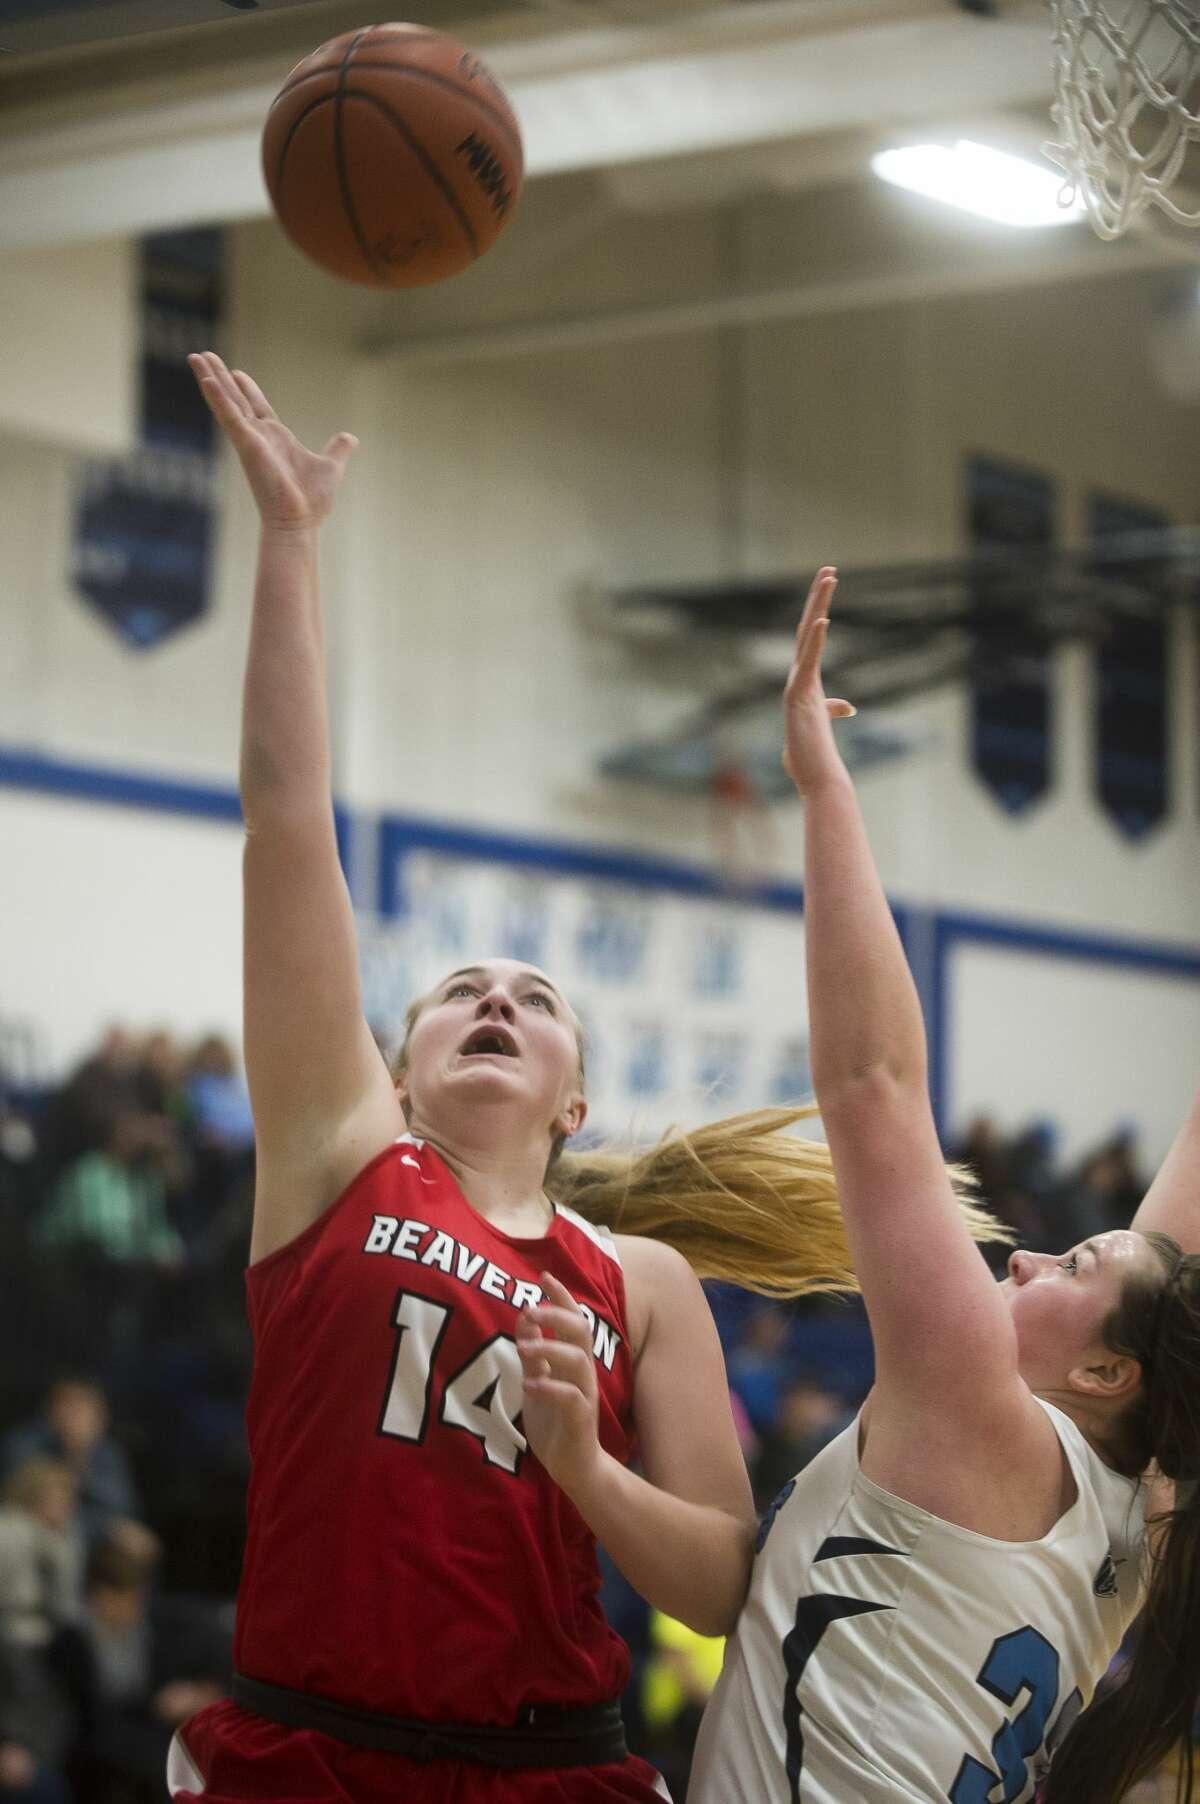 Beaverton senior Ann-Marie Hicks takes a shot during the Beavers' game against Meridian on Friday, Jan. 5, 2018 at Meridian High School. (Katy Kildee/kkildee@mdn.net)